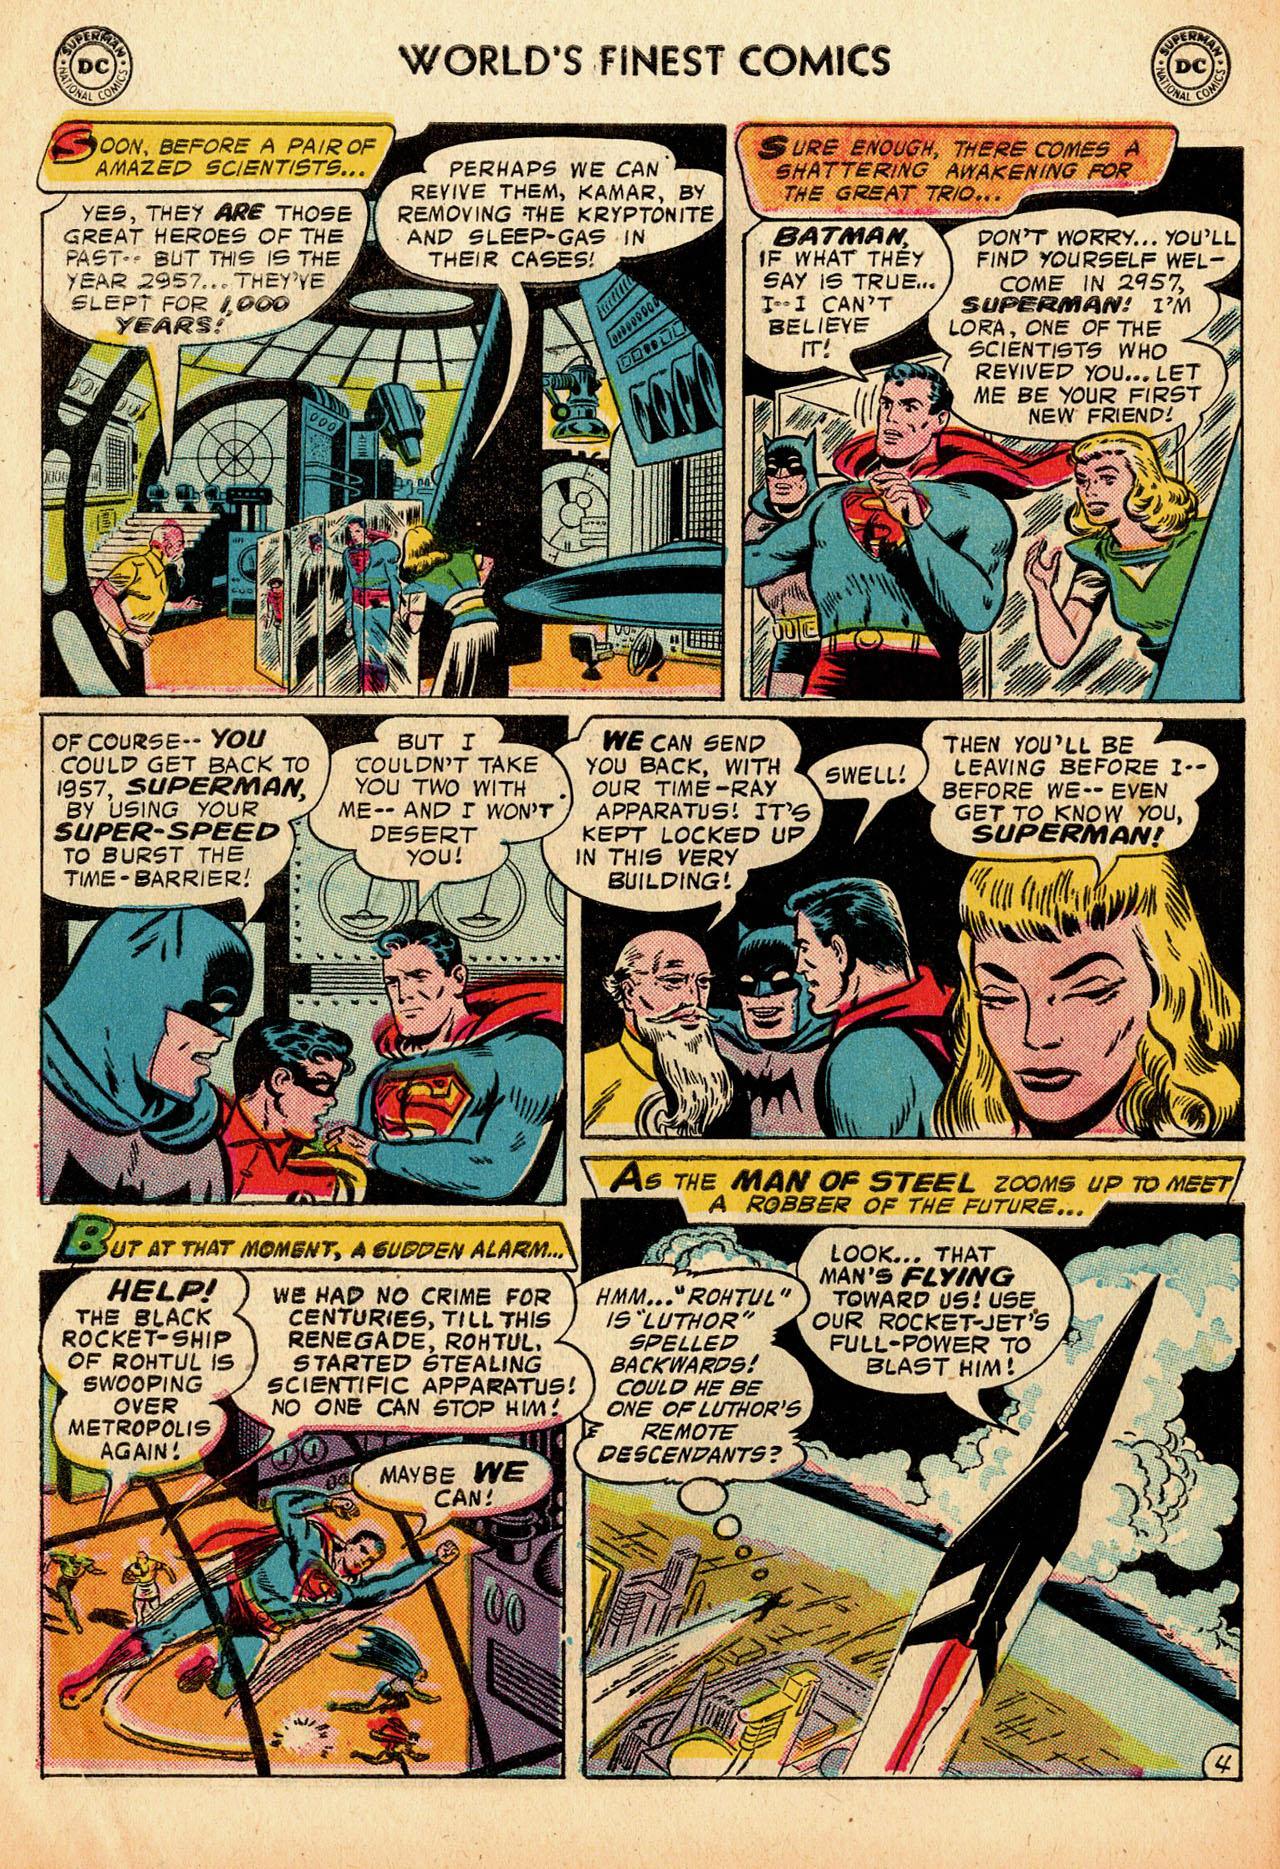 Read online World's Finest Comics comic -  Issue #91 - 6